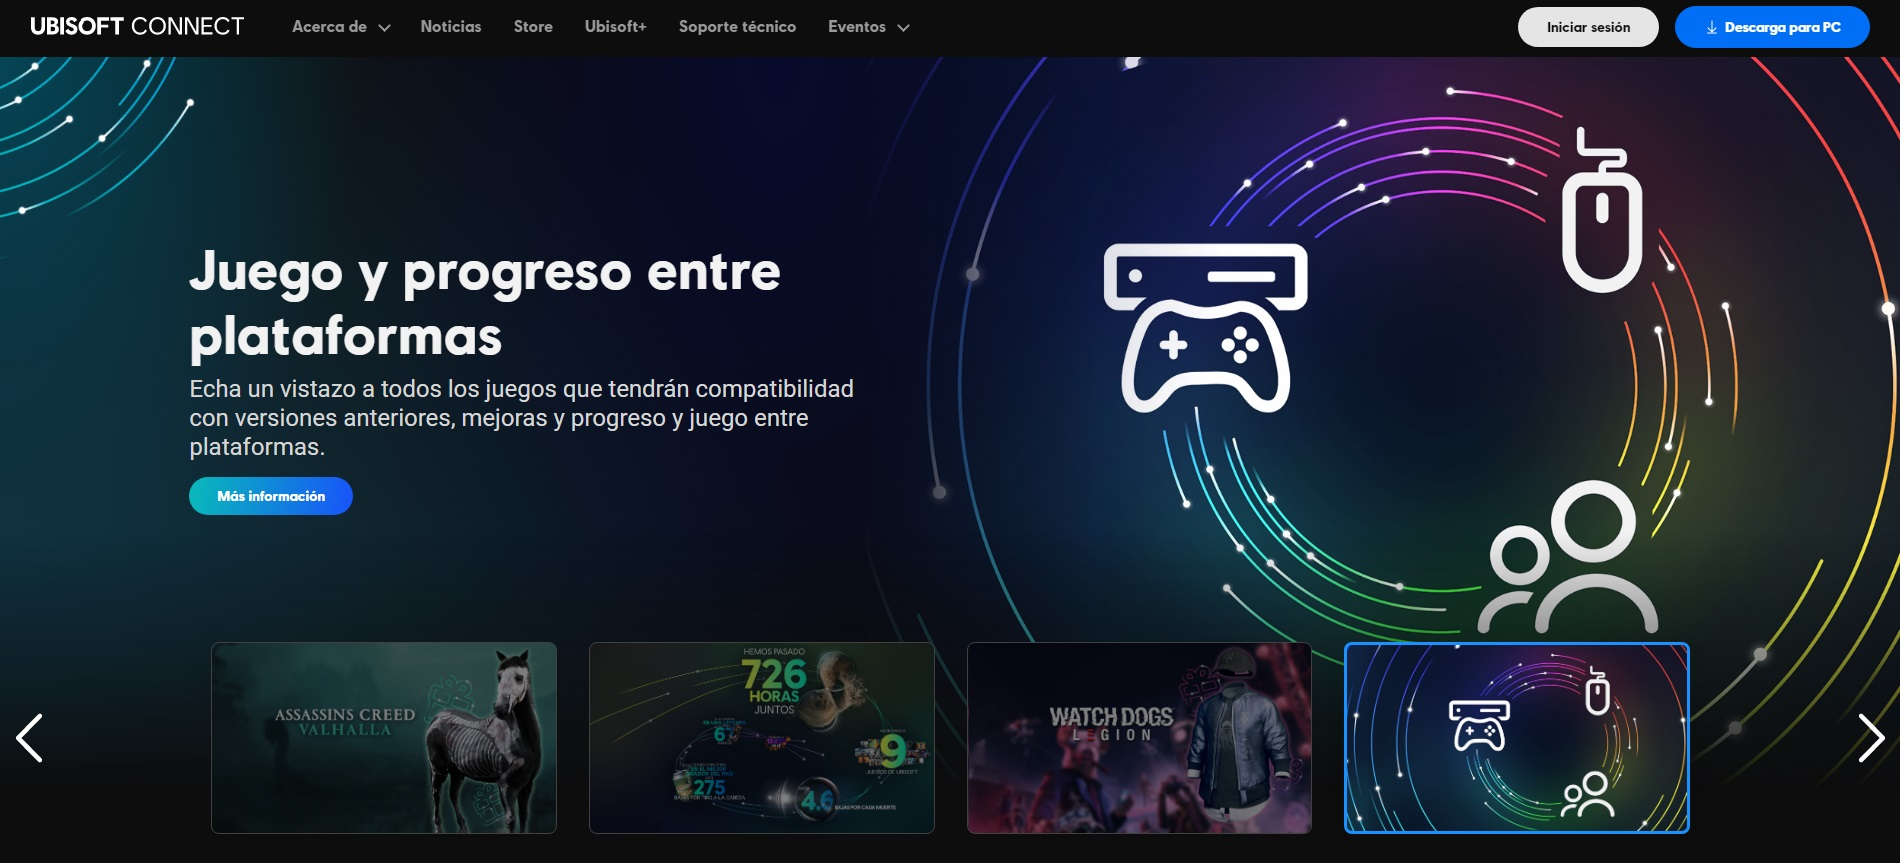 Página oficial de Ubisoft Connect